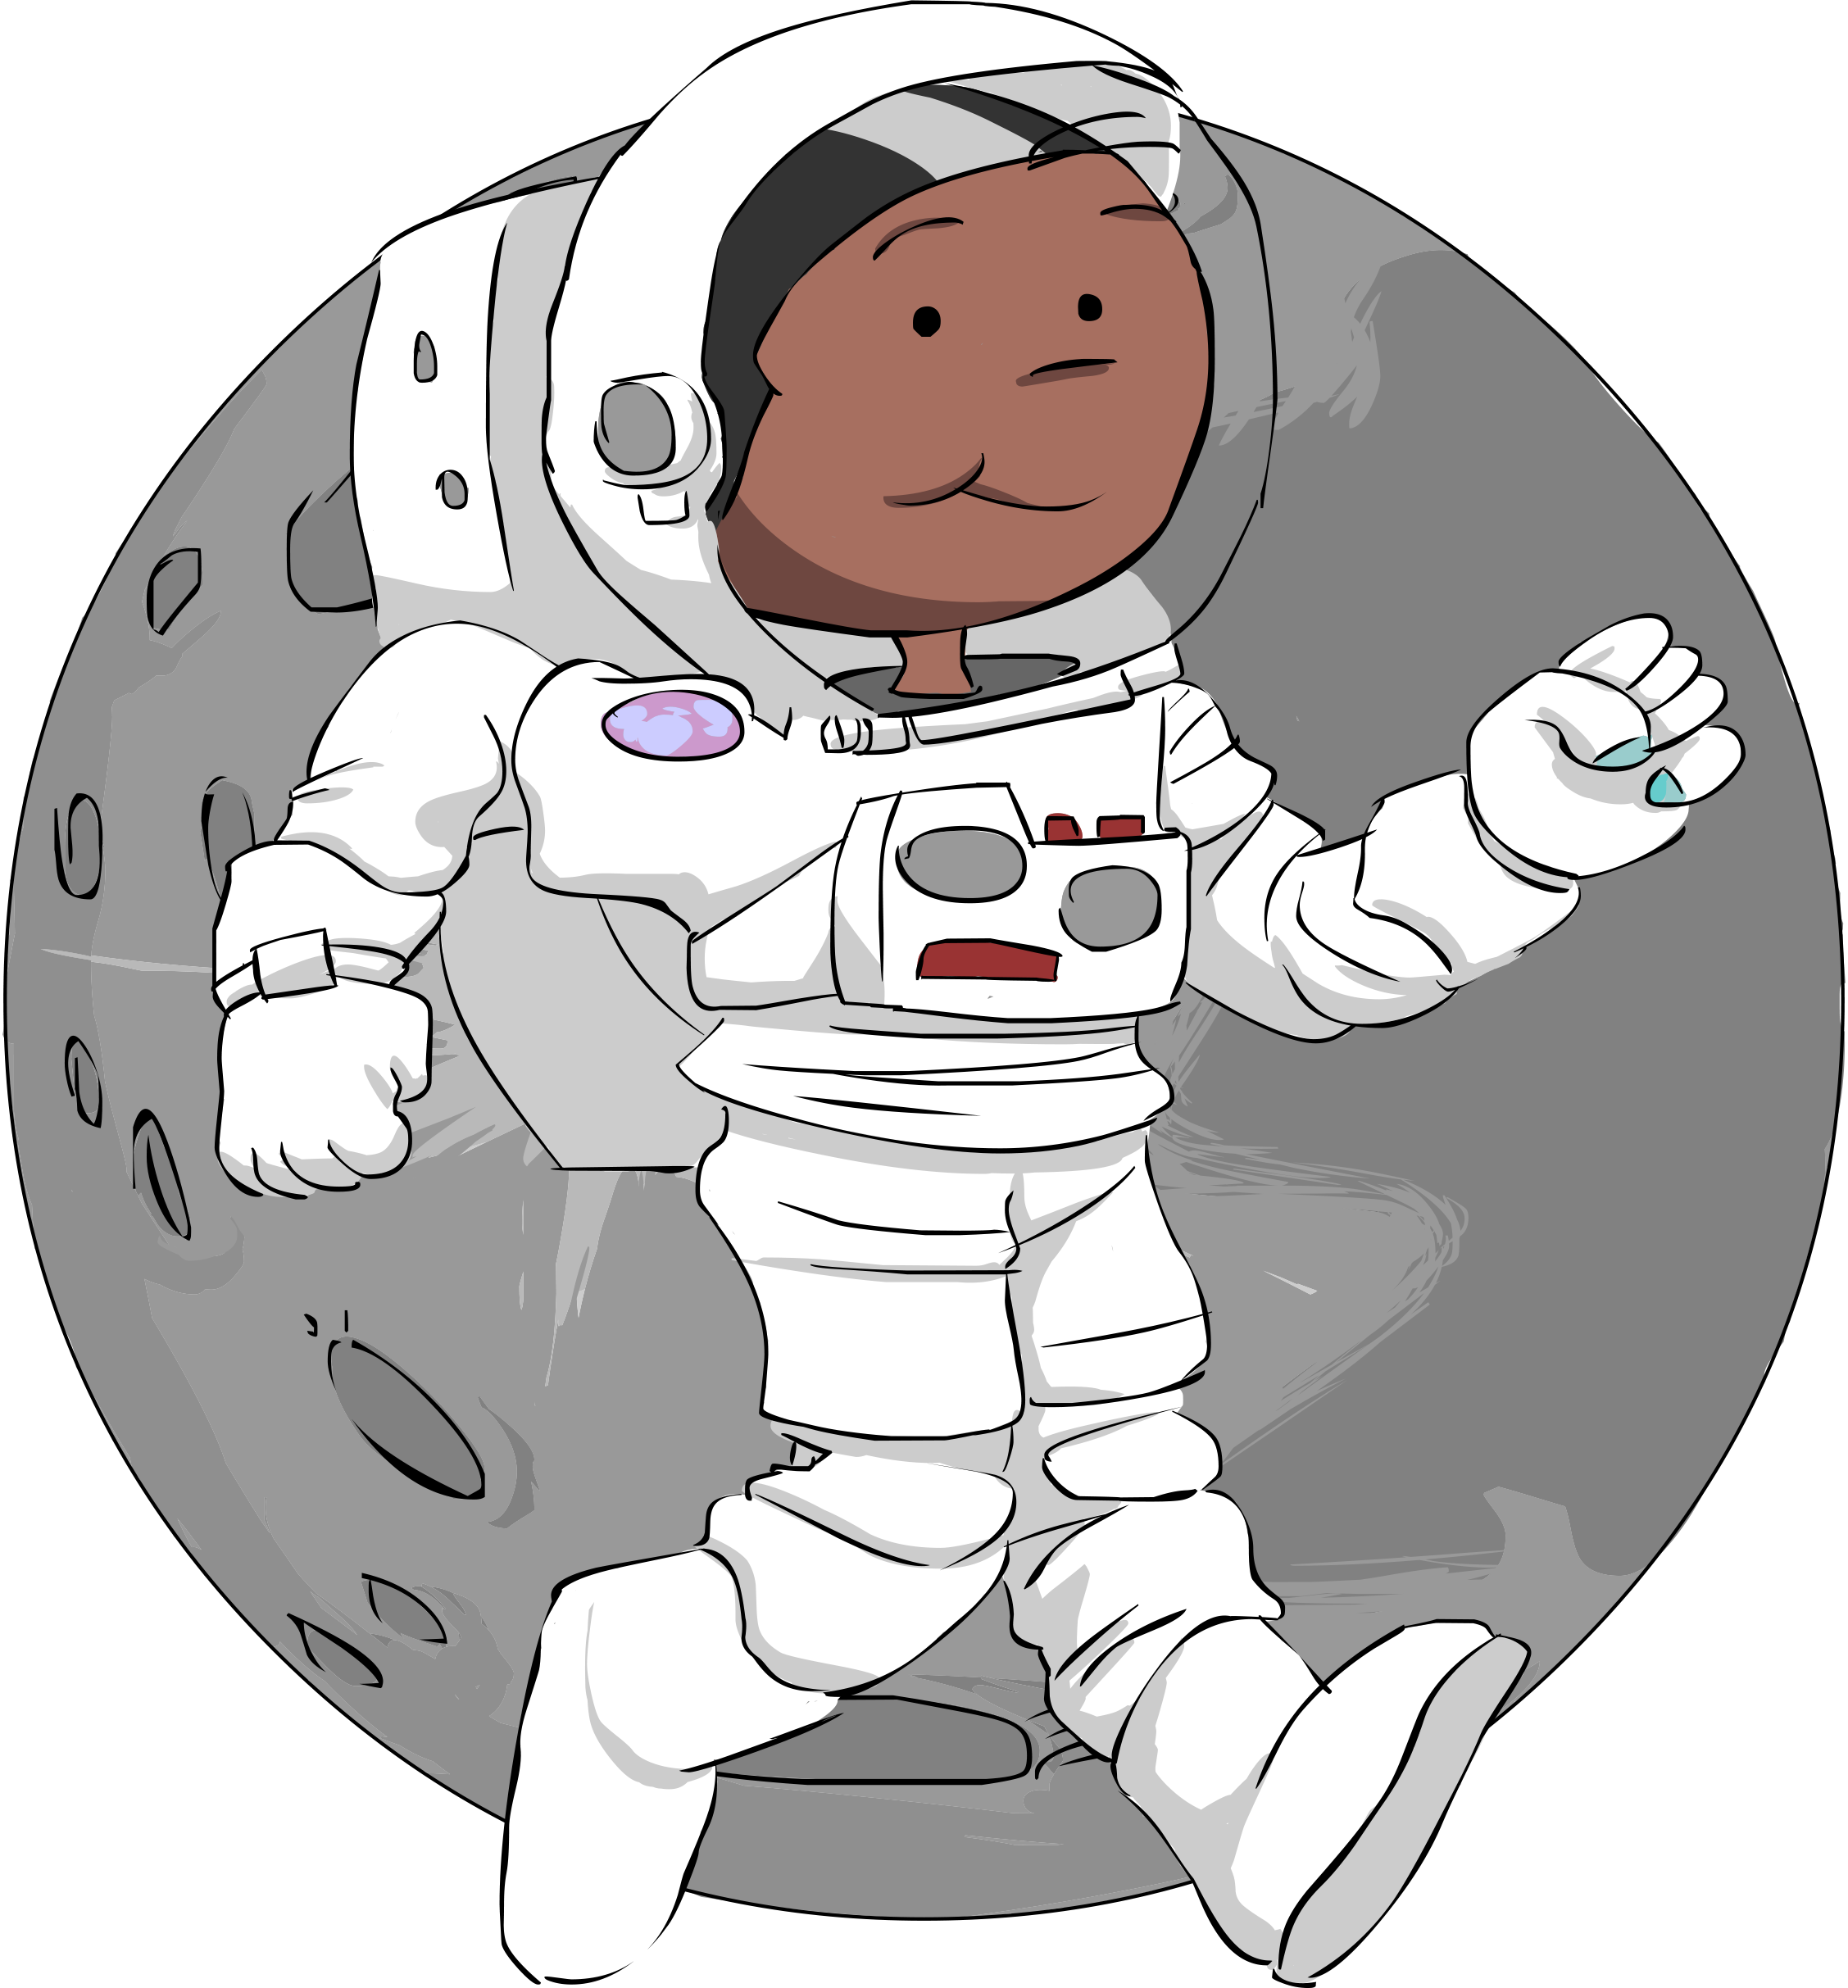 prx_missionx_defi-lune.png